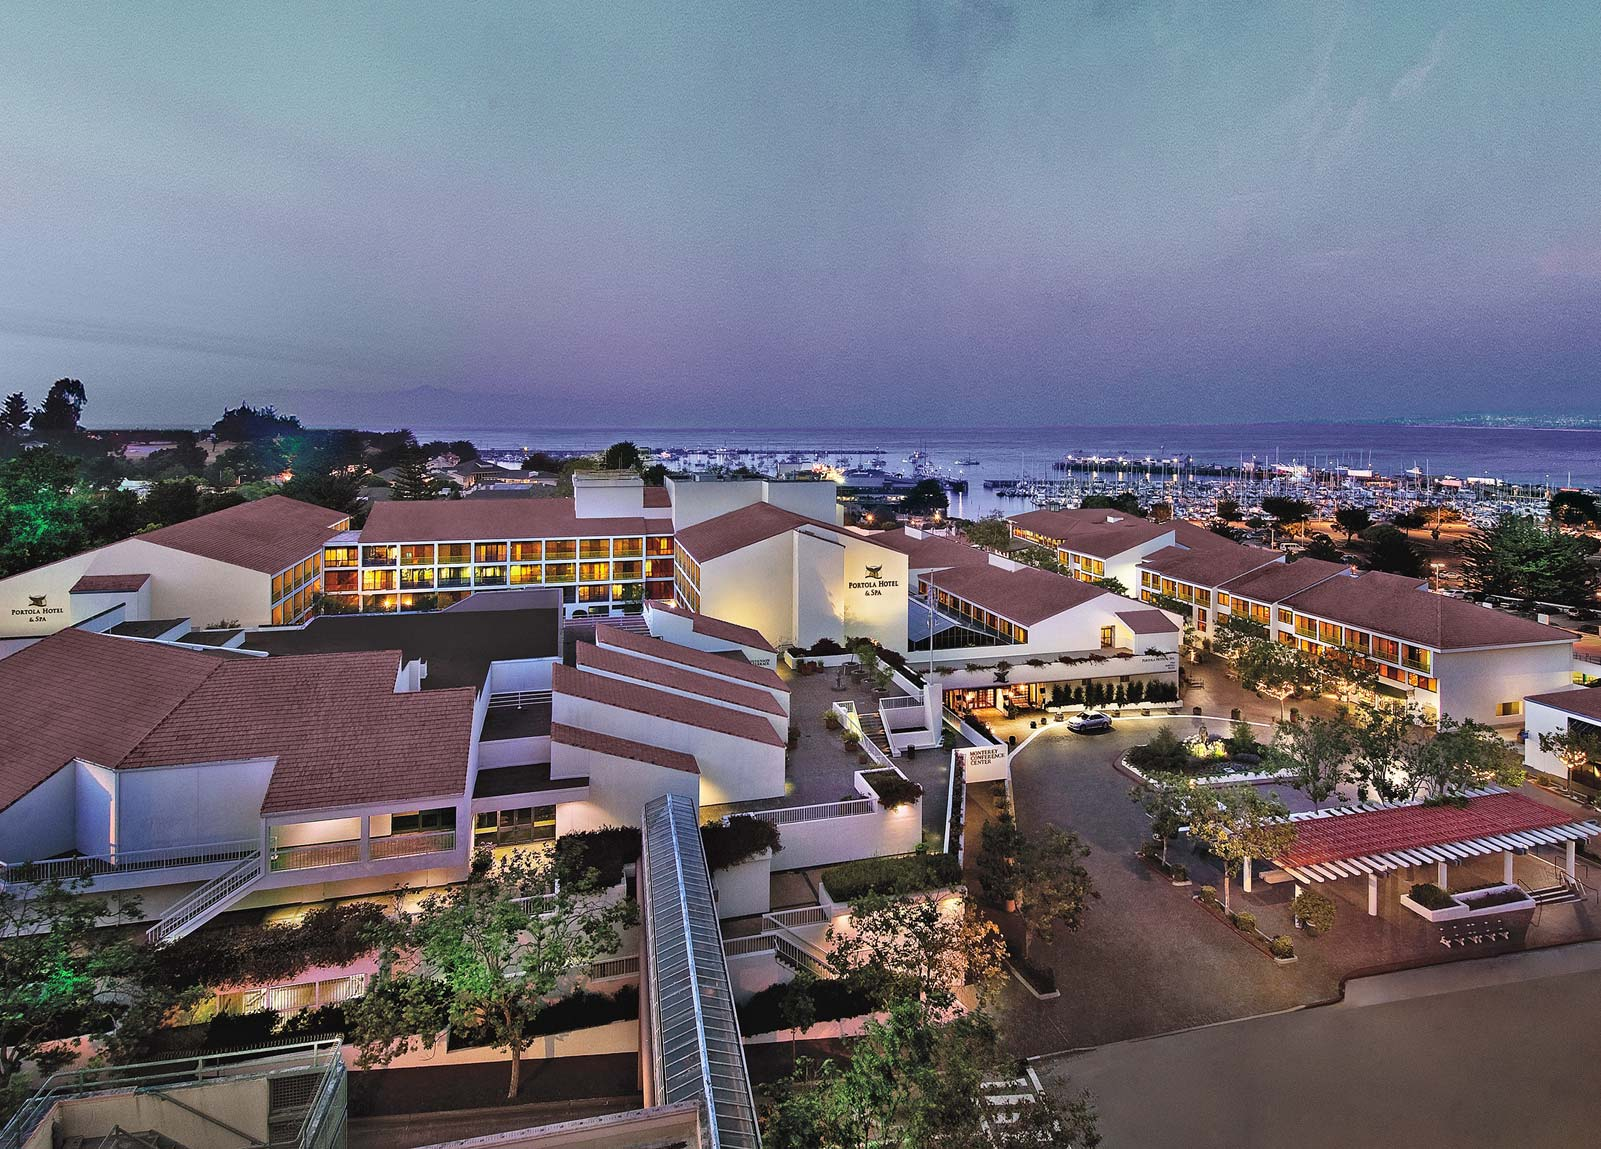 portola-hotel-and-spa.jpg